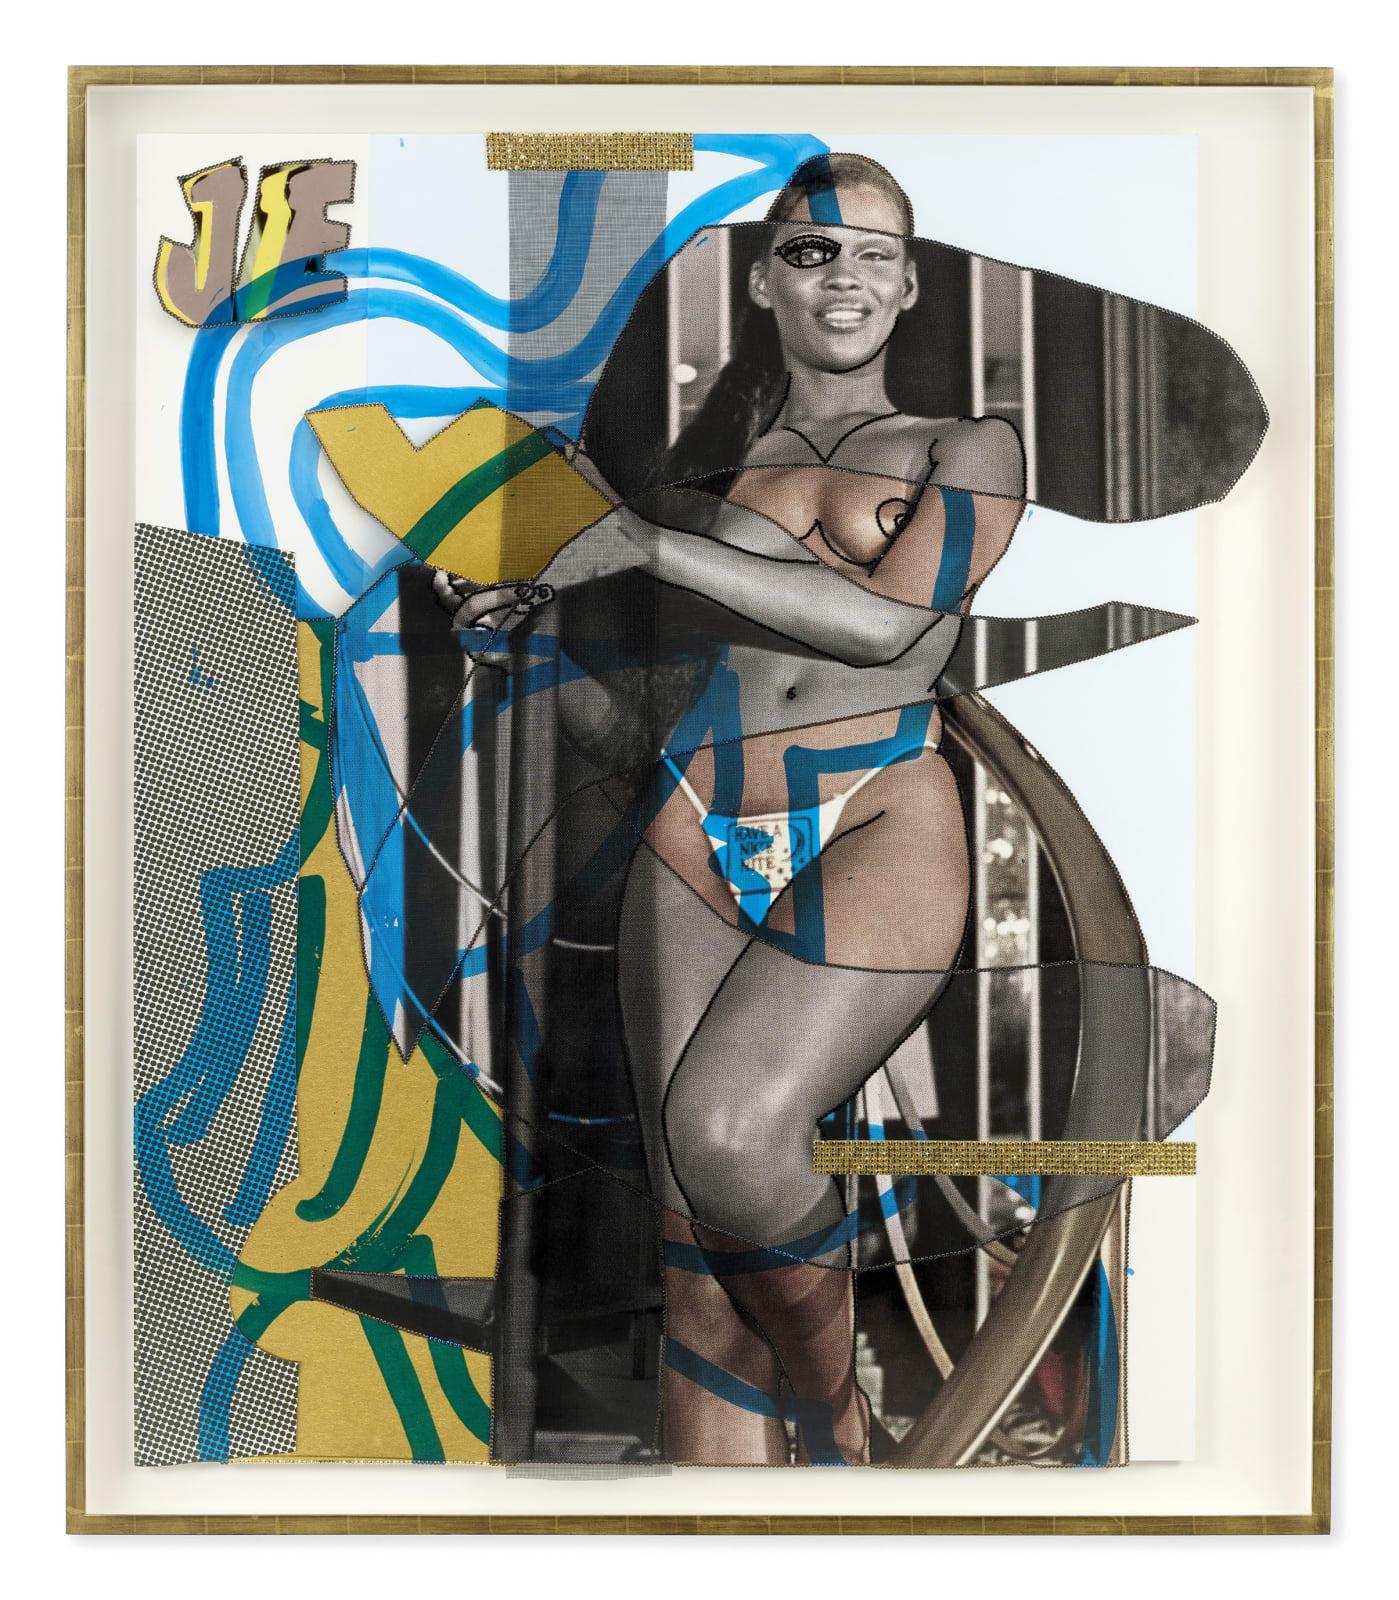 Mickalene Thomas Jet Blue #41, 2021 Color photograph, mixed media paper, acrylic paint, rhinestones, fiberglass mesh on museum paper mounted on dibond 65 7/8 x 56 3/4 inches - 167,3 x 144,1 cm